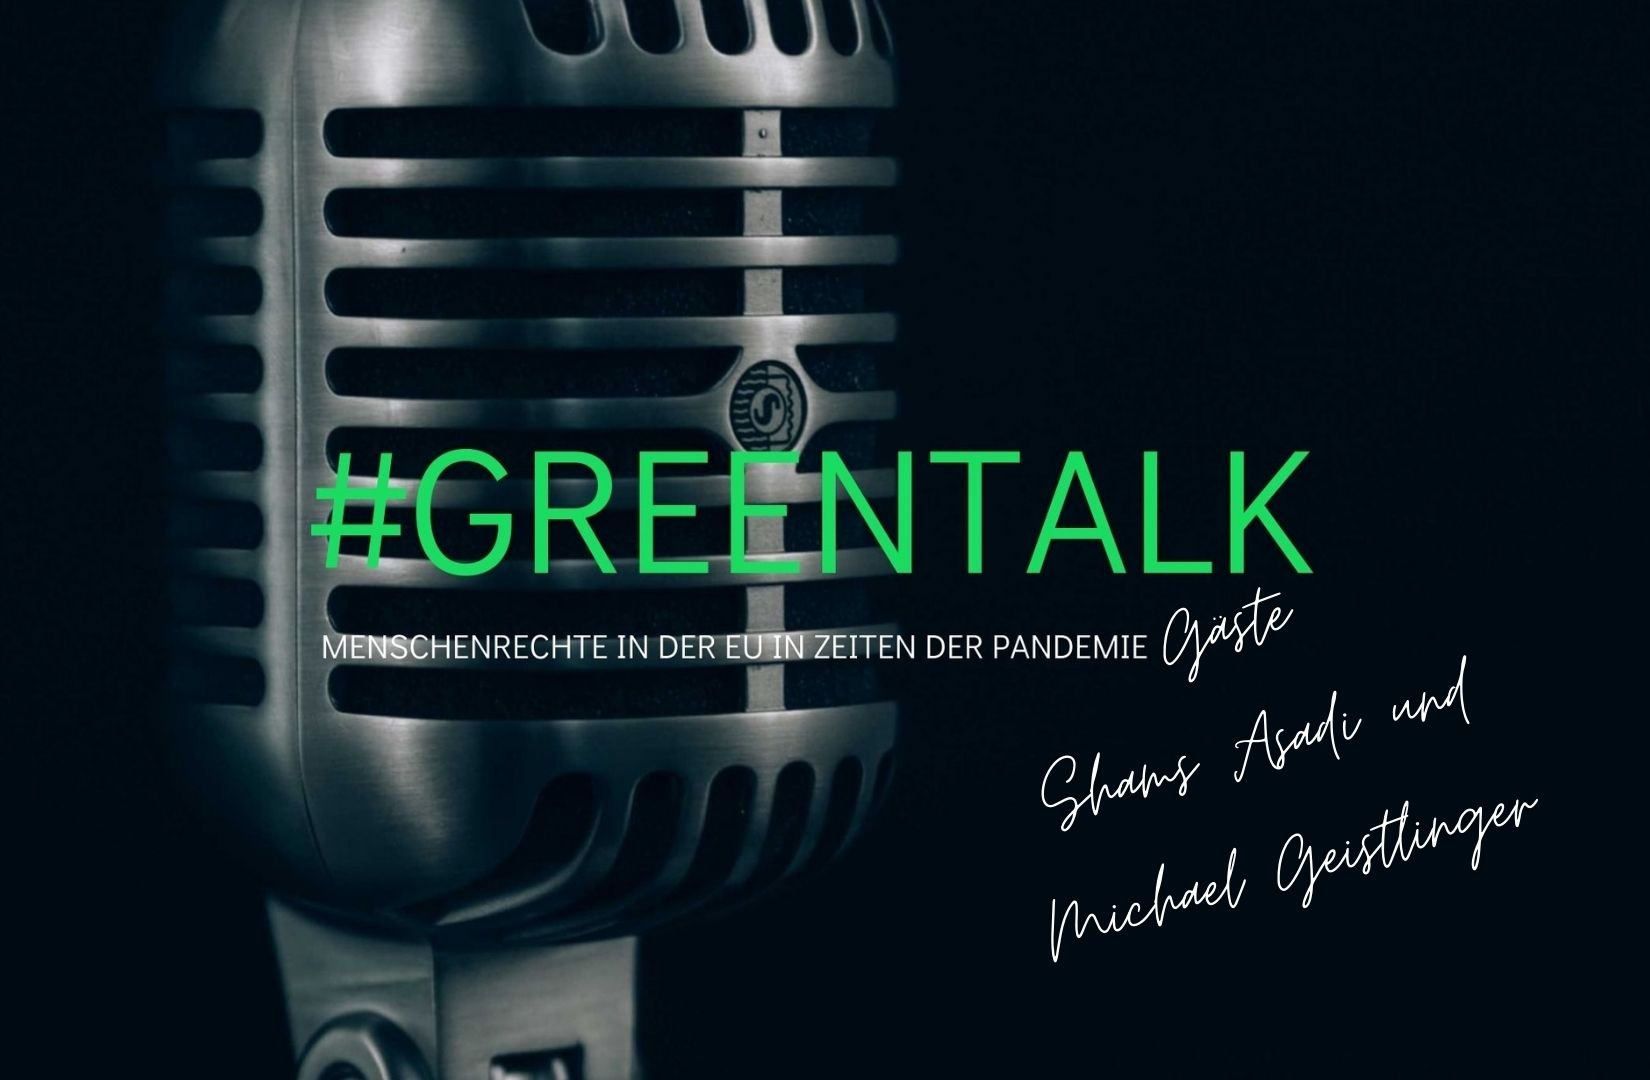 GreenTalk | Gäste: Shams Asadi und Michael Geistlinger